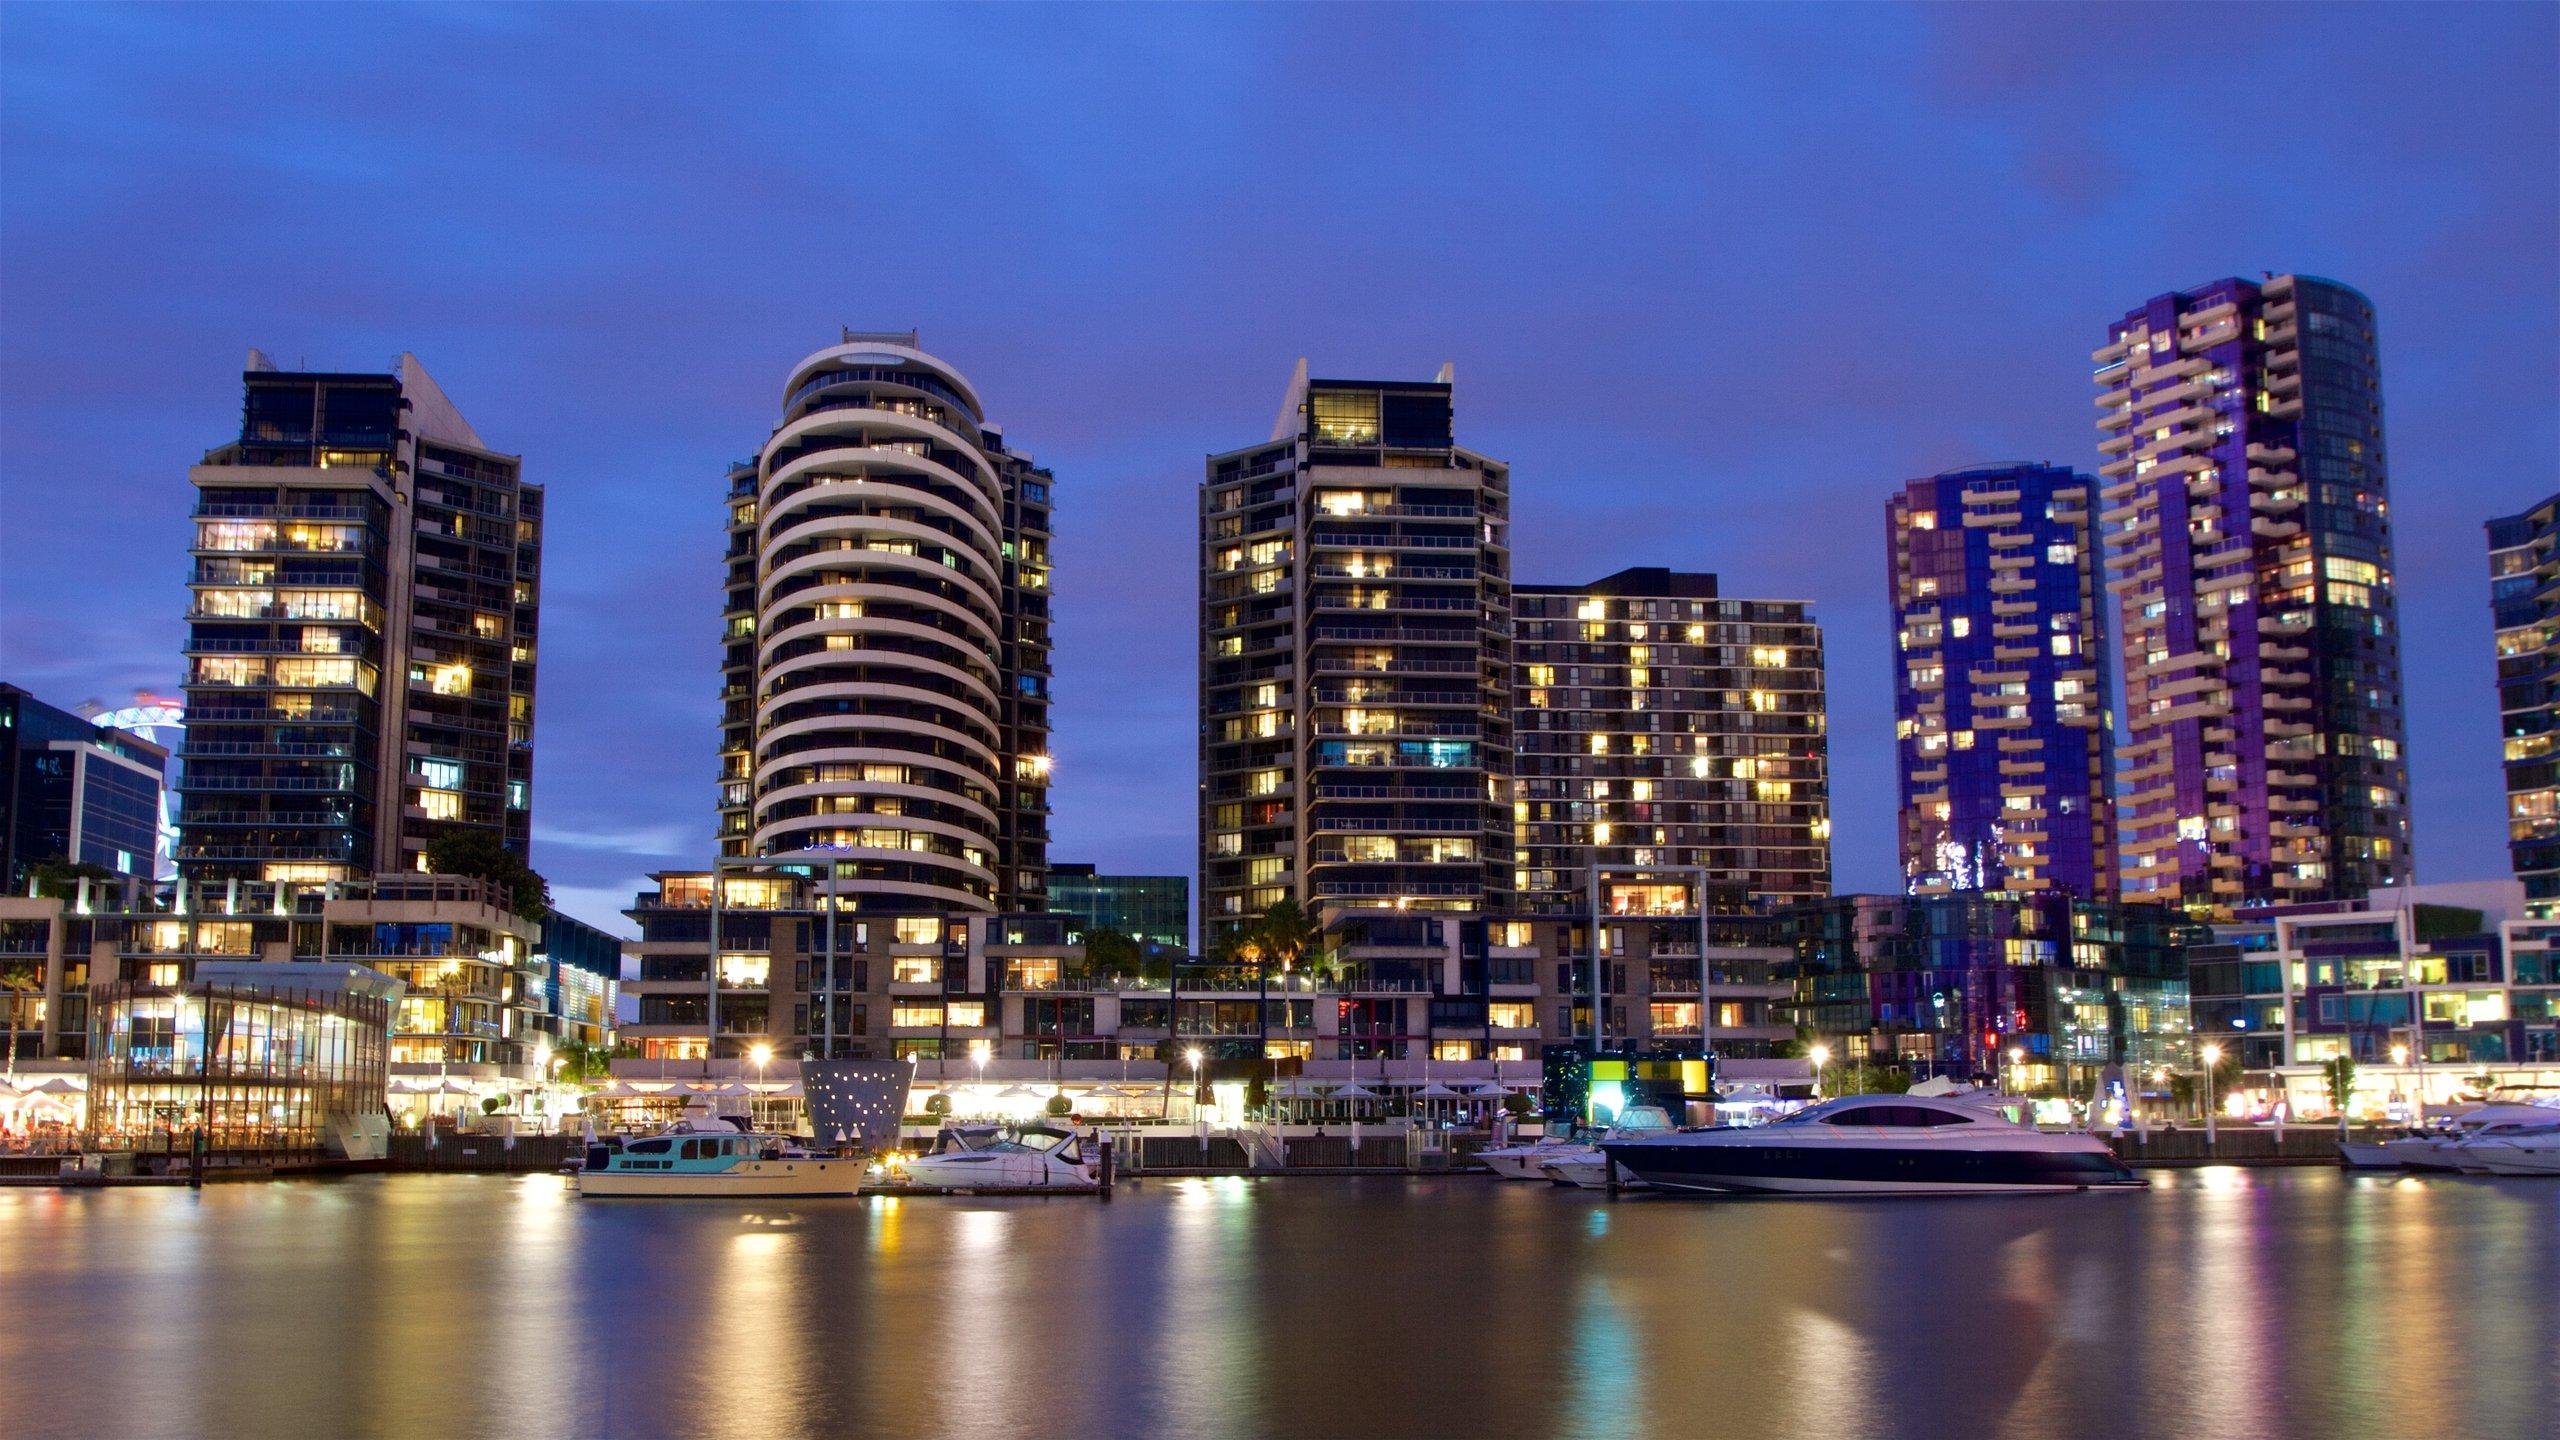 Docklands, Melbourne, Victoria, Australia